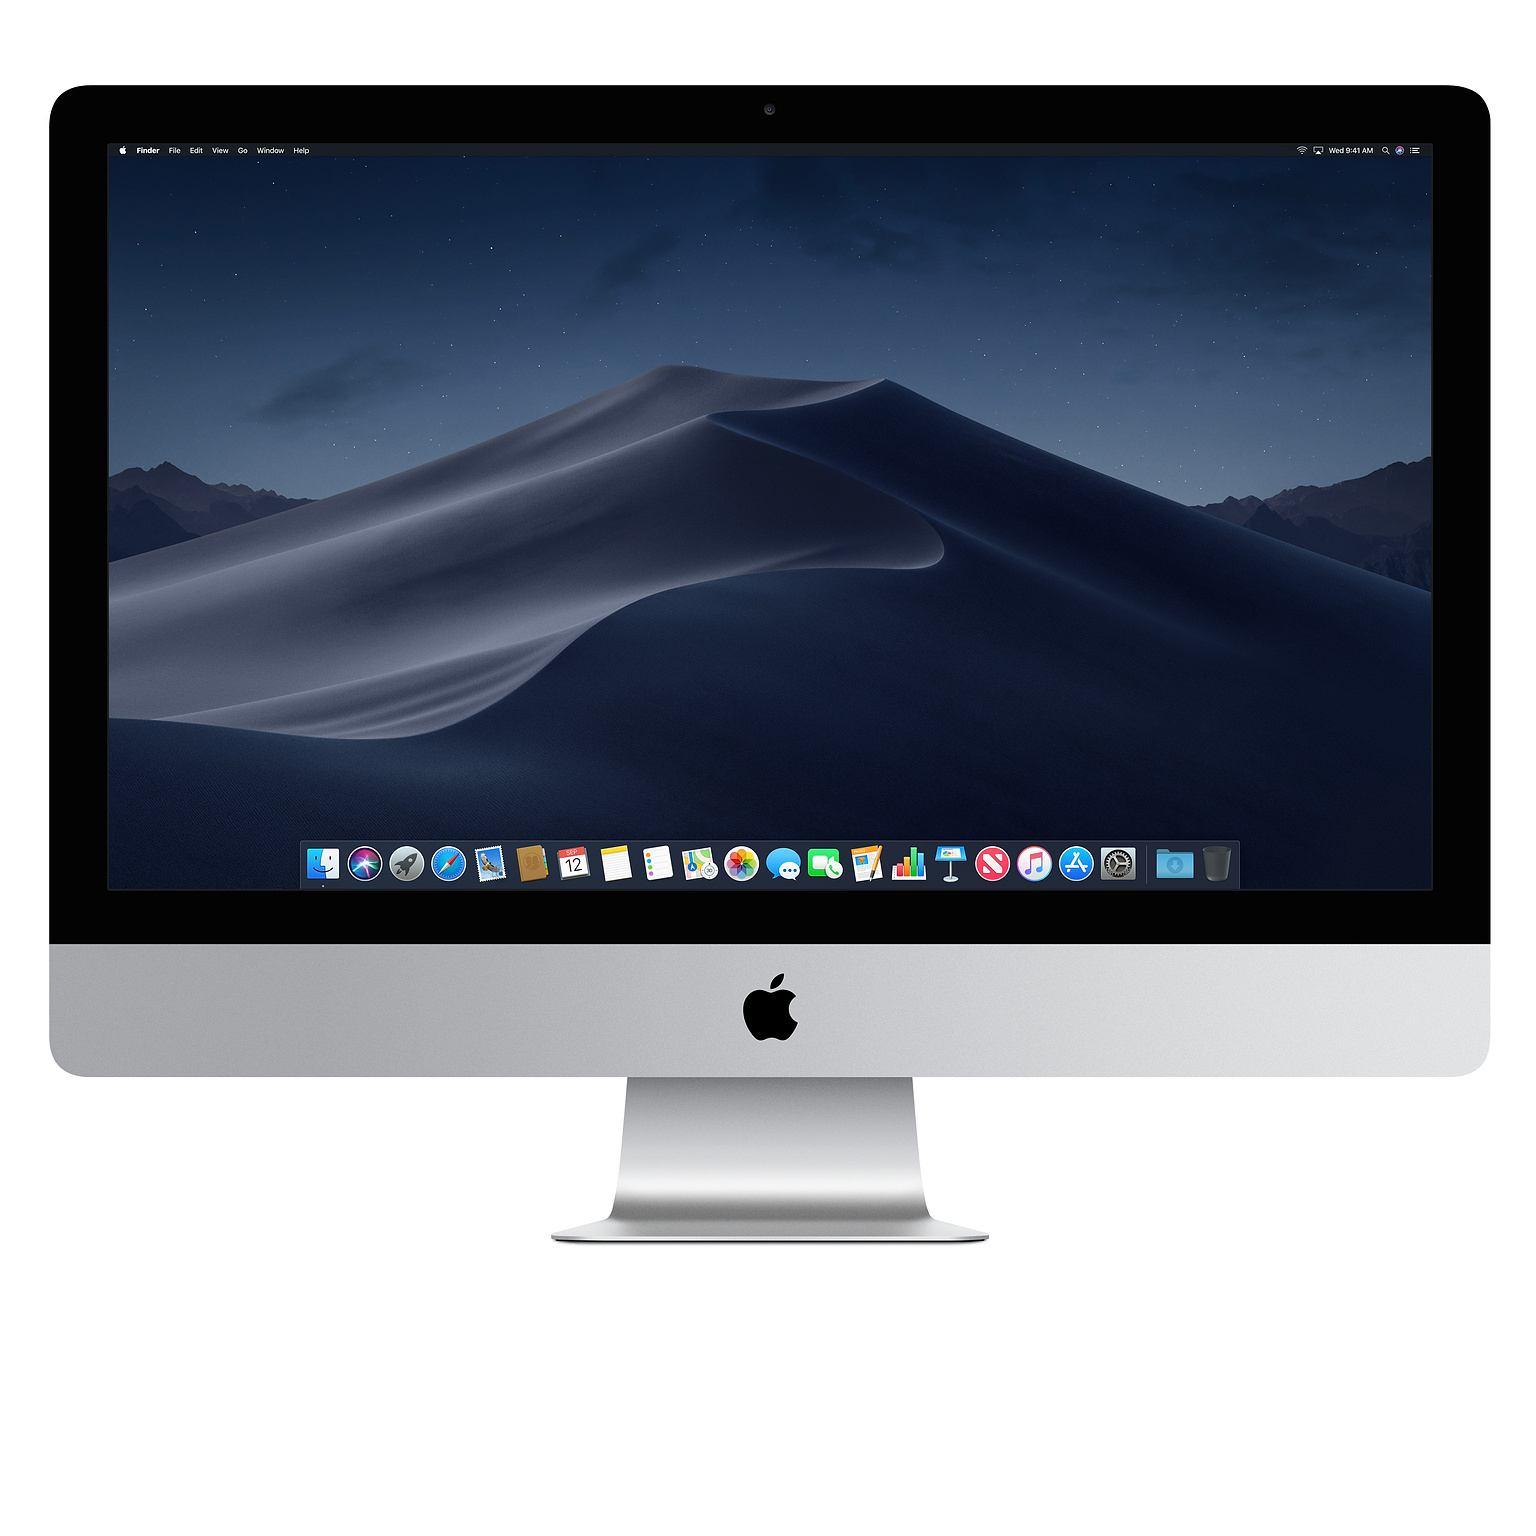 2022274-Apple-iMac-54-6-cm-21-5-4096-x-2304-Pixel-Intel-Core-i5-di-ottava-ge